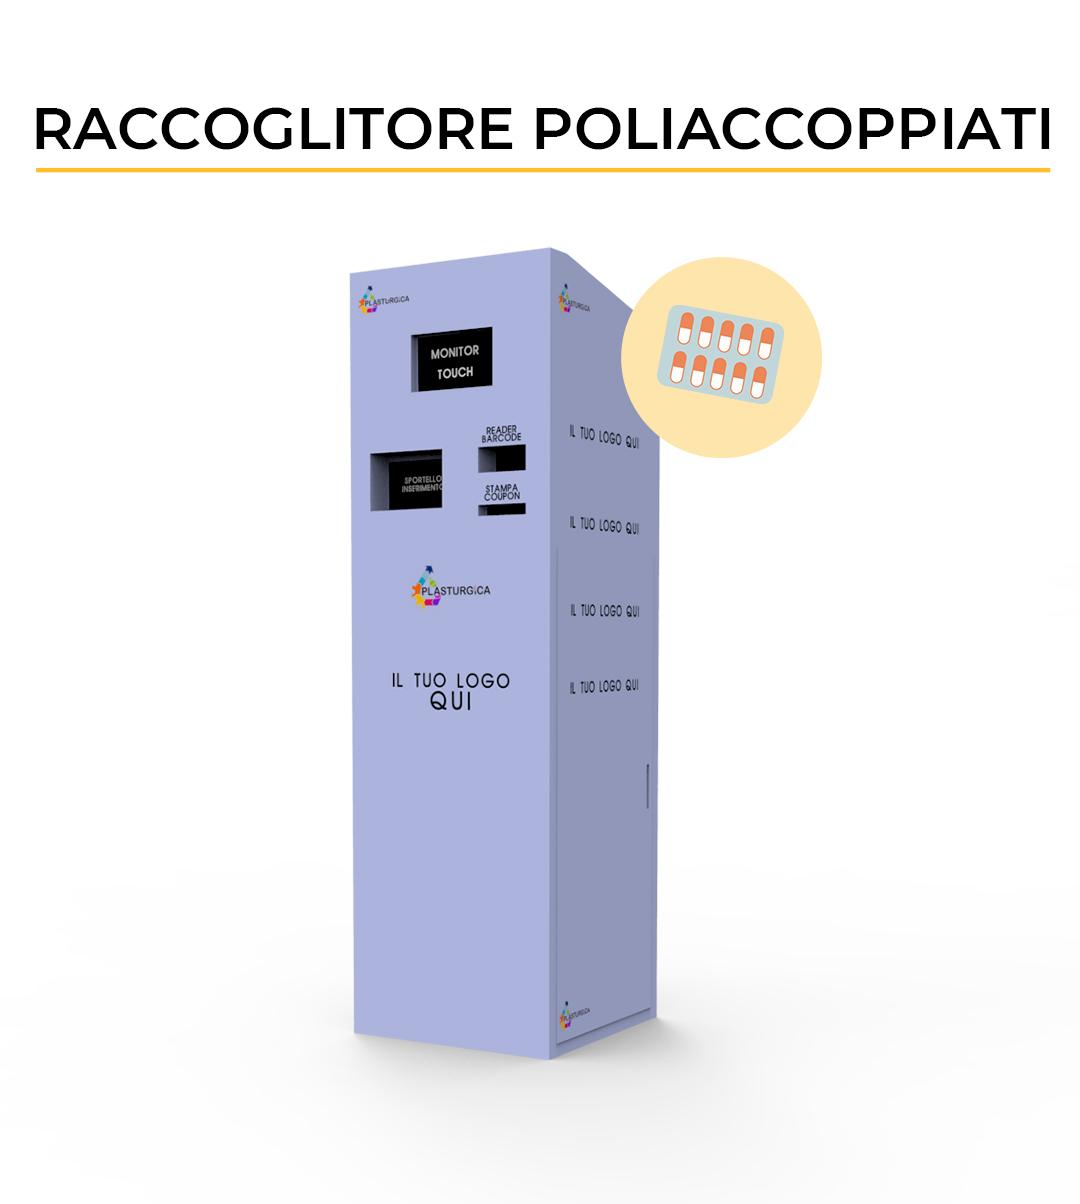 reverse-vending-poliaccoppiati